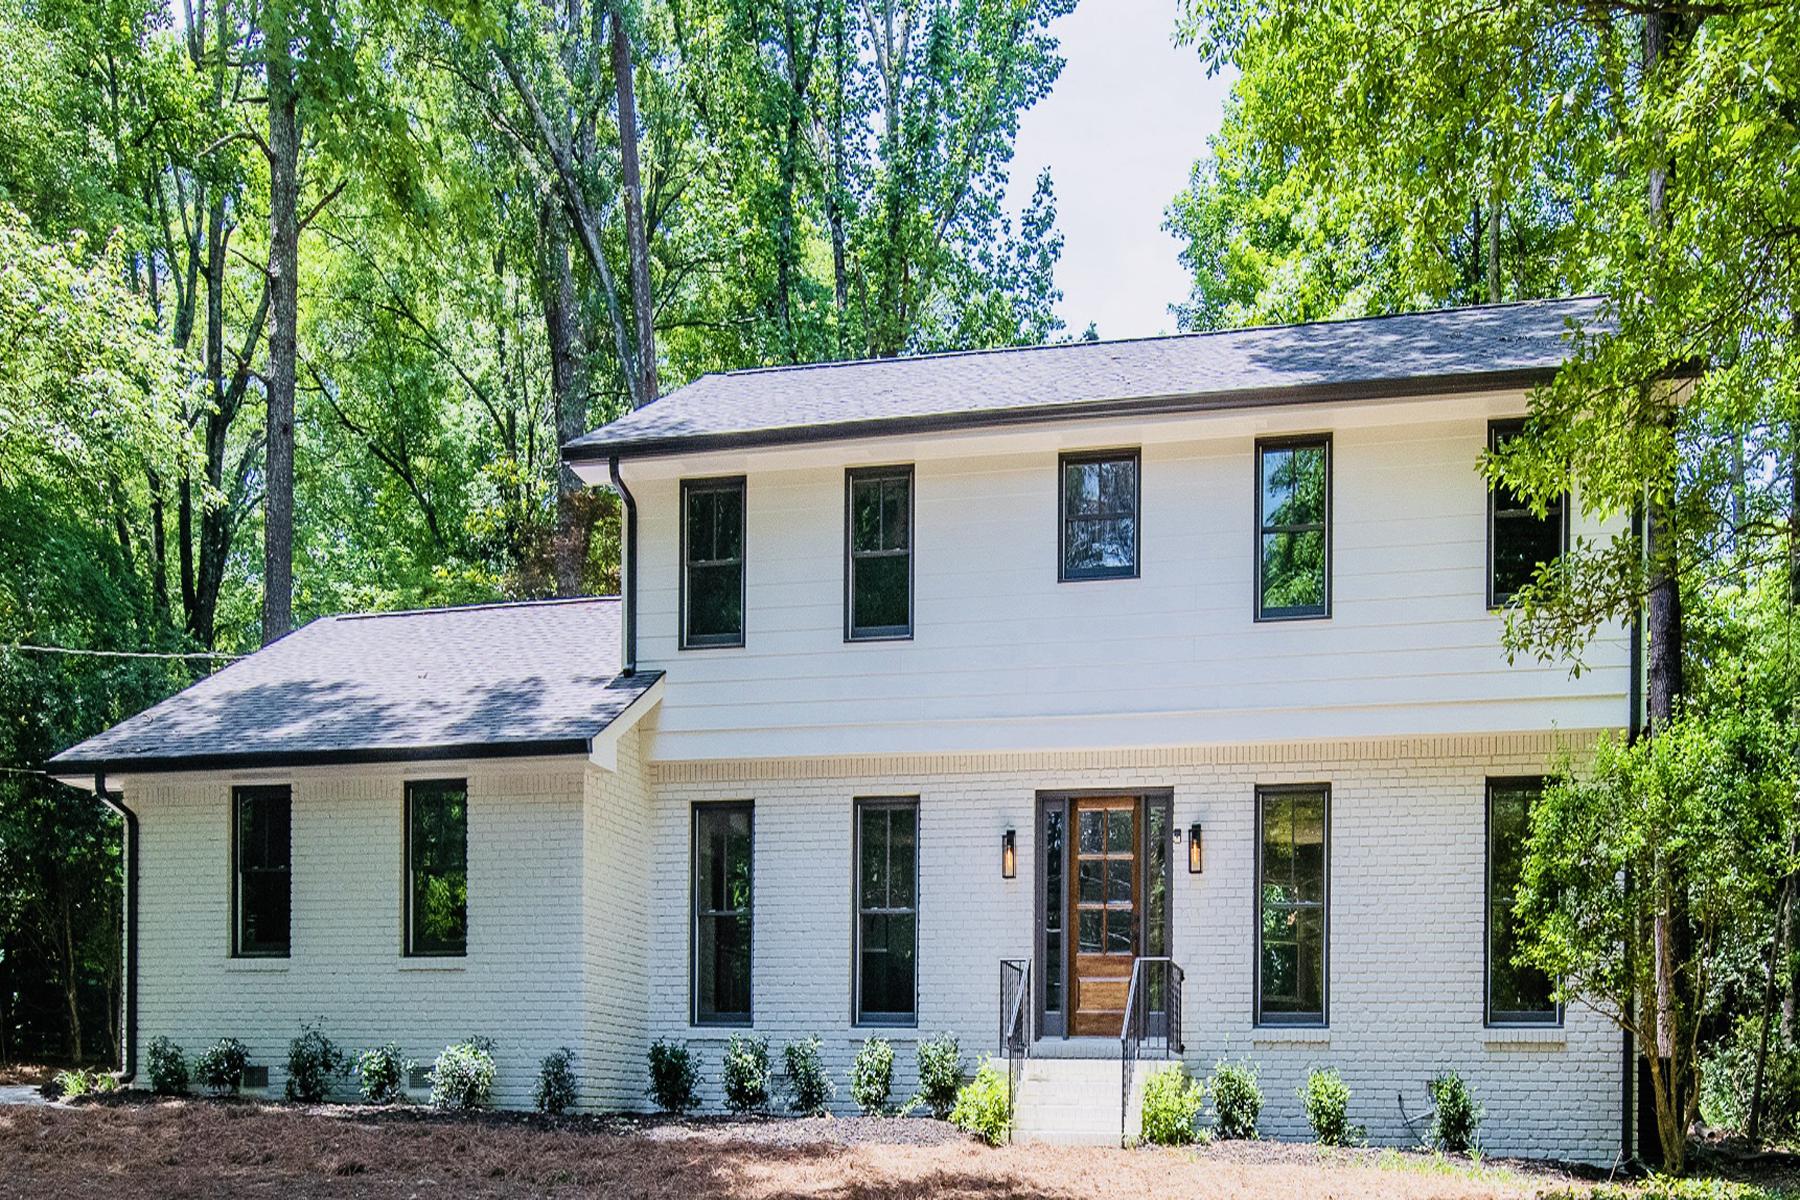 Single Family Homes для того Продажа на Modern/Rustic Renovation Close to Austin Elementary 1187 Verdon Dr, Dunwoody, Джорджия 30338 Соединенные Штаты